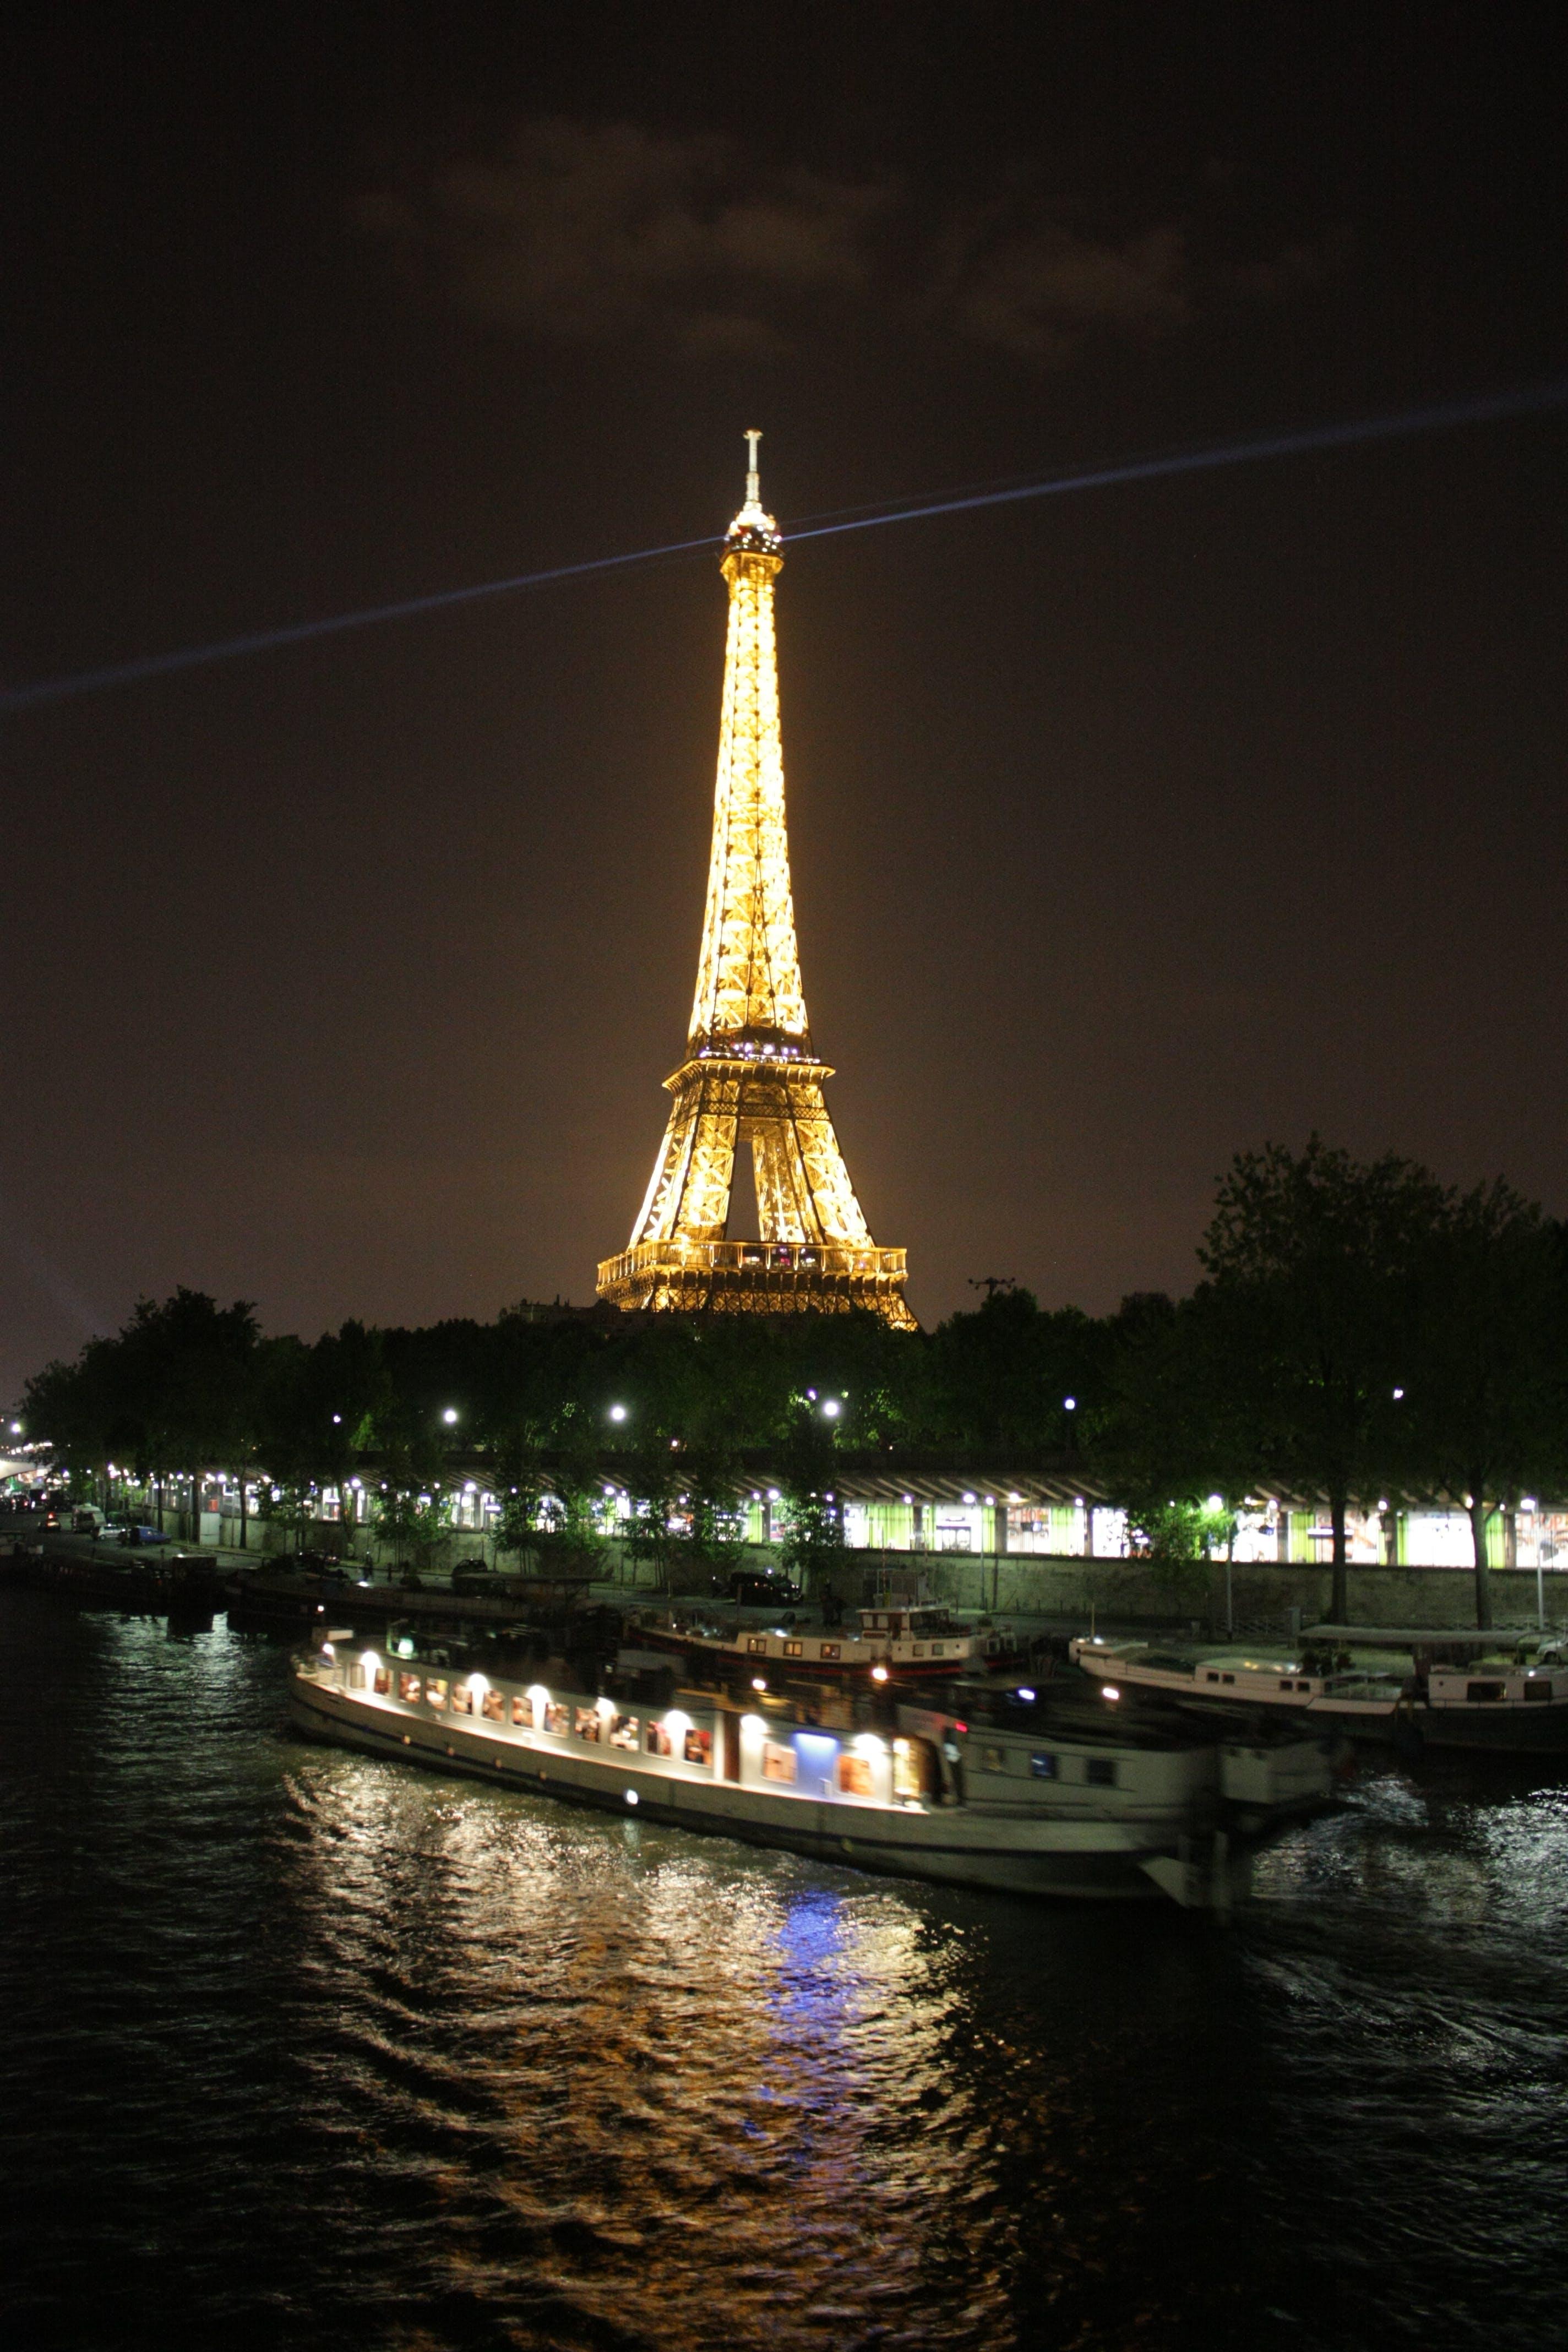 Fotos de stock gratuitas de Francia, París, Torre Eiffel